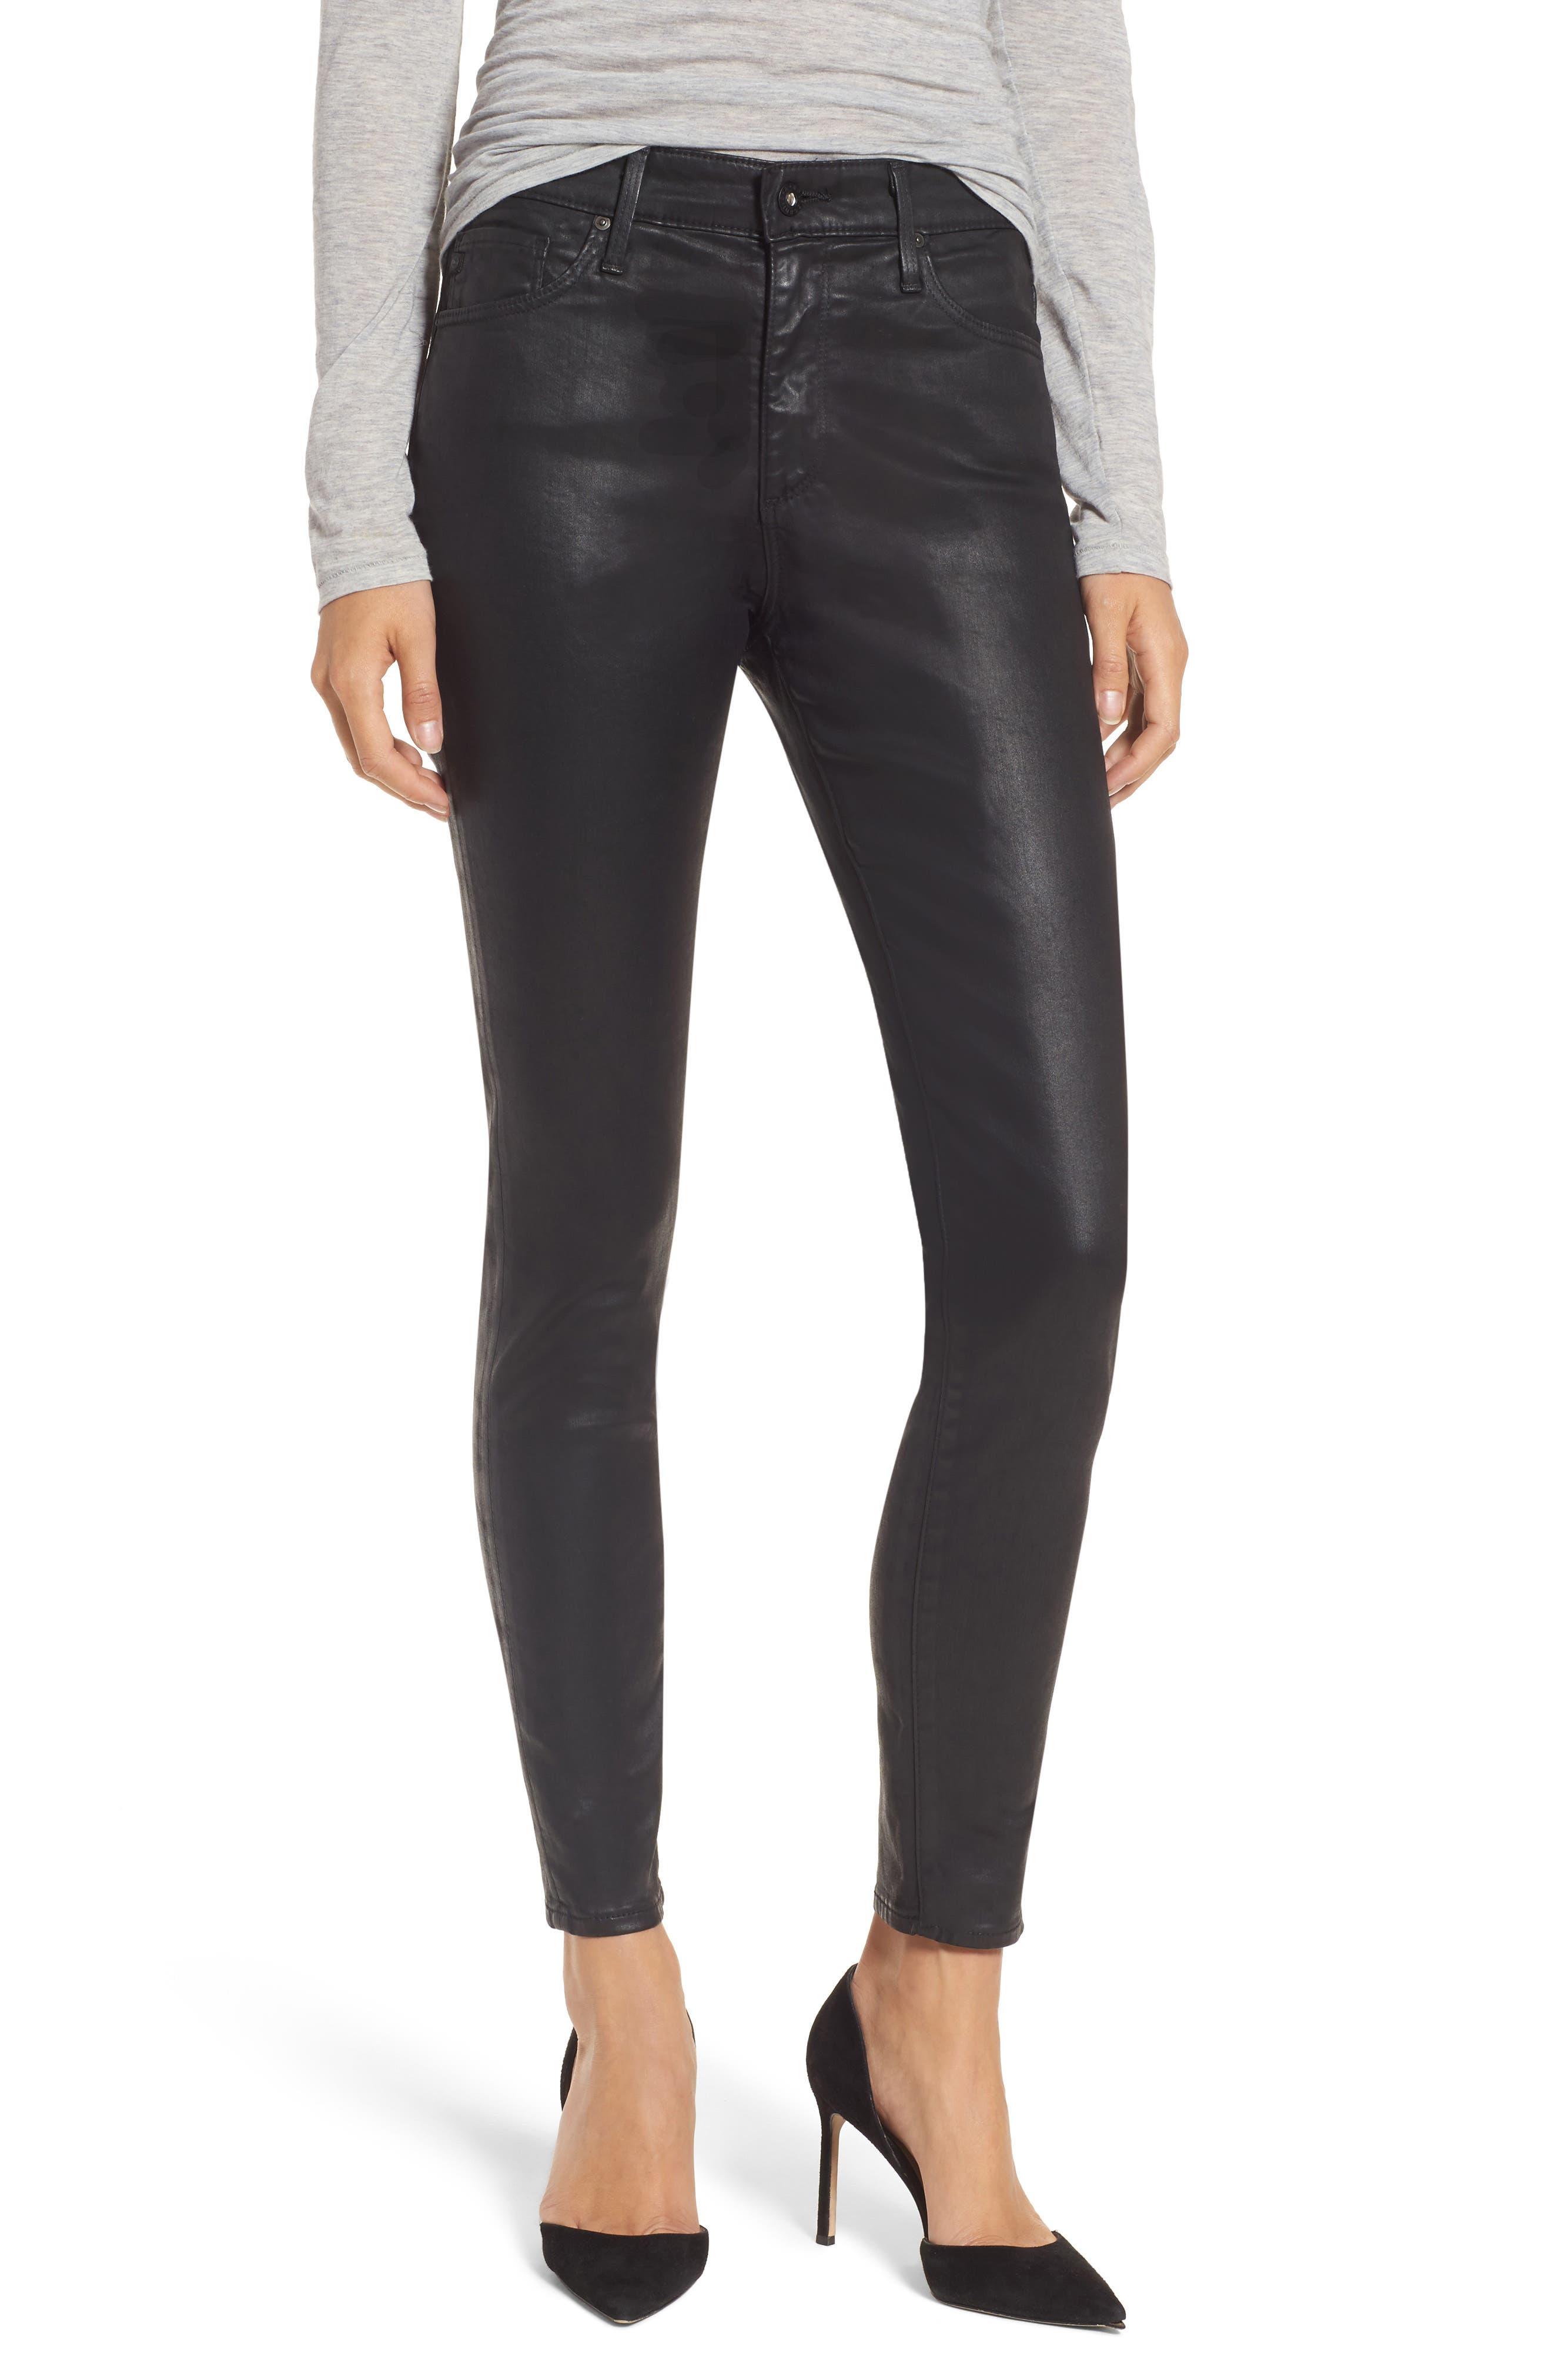 Farrah High Waist Ankle Skinny Jeans,                             Main thumbnail 1, color,                             Leatherette Super Black